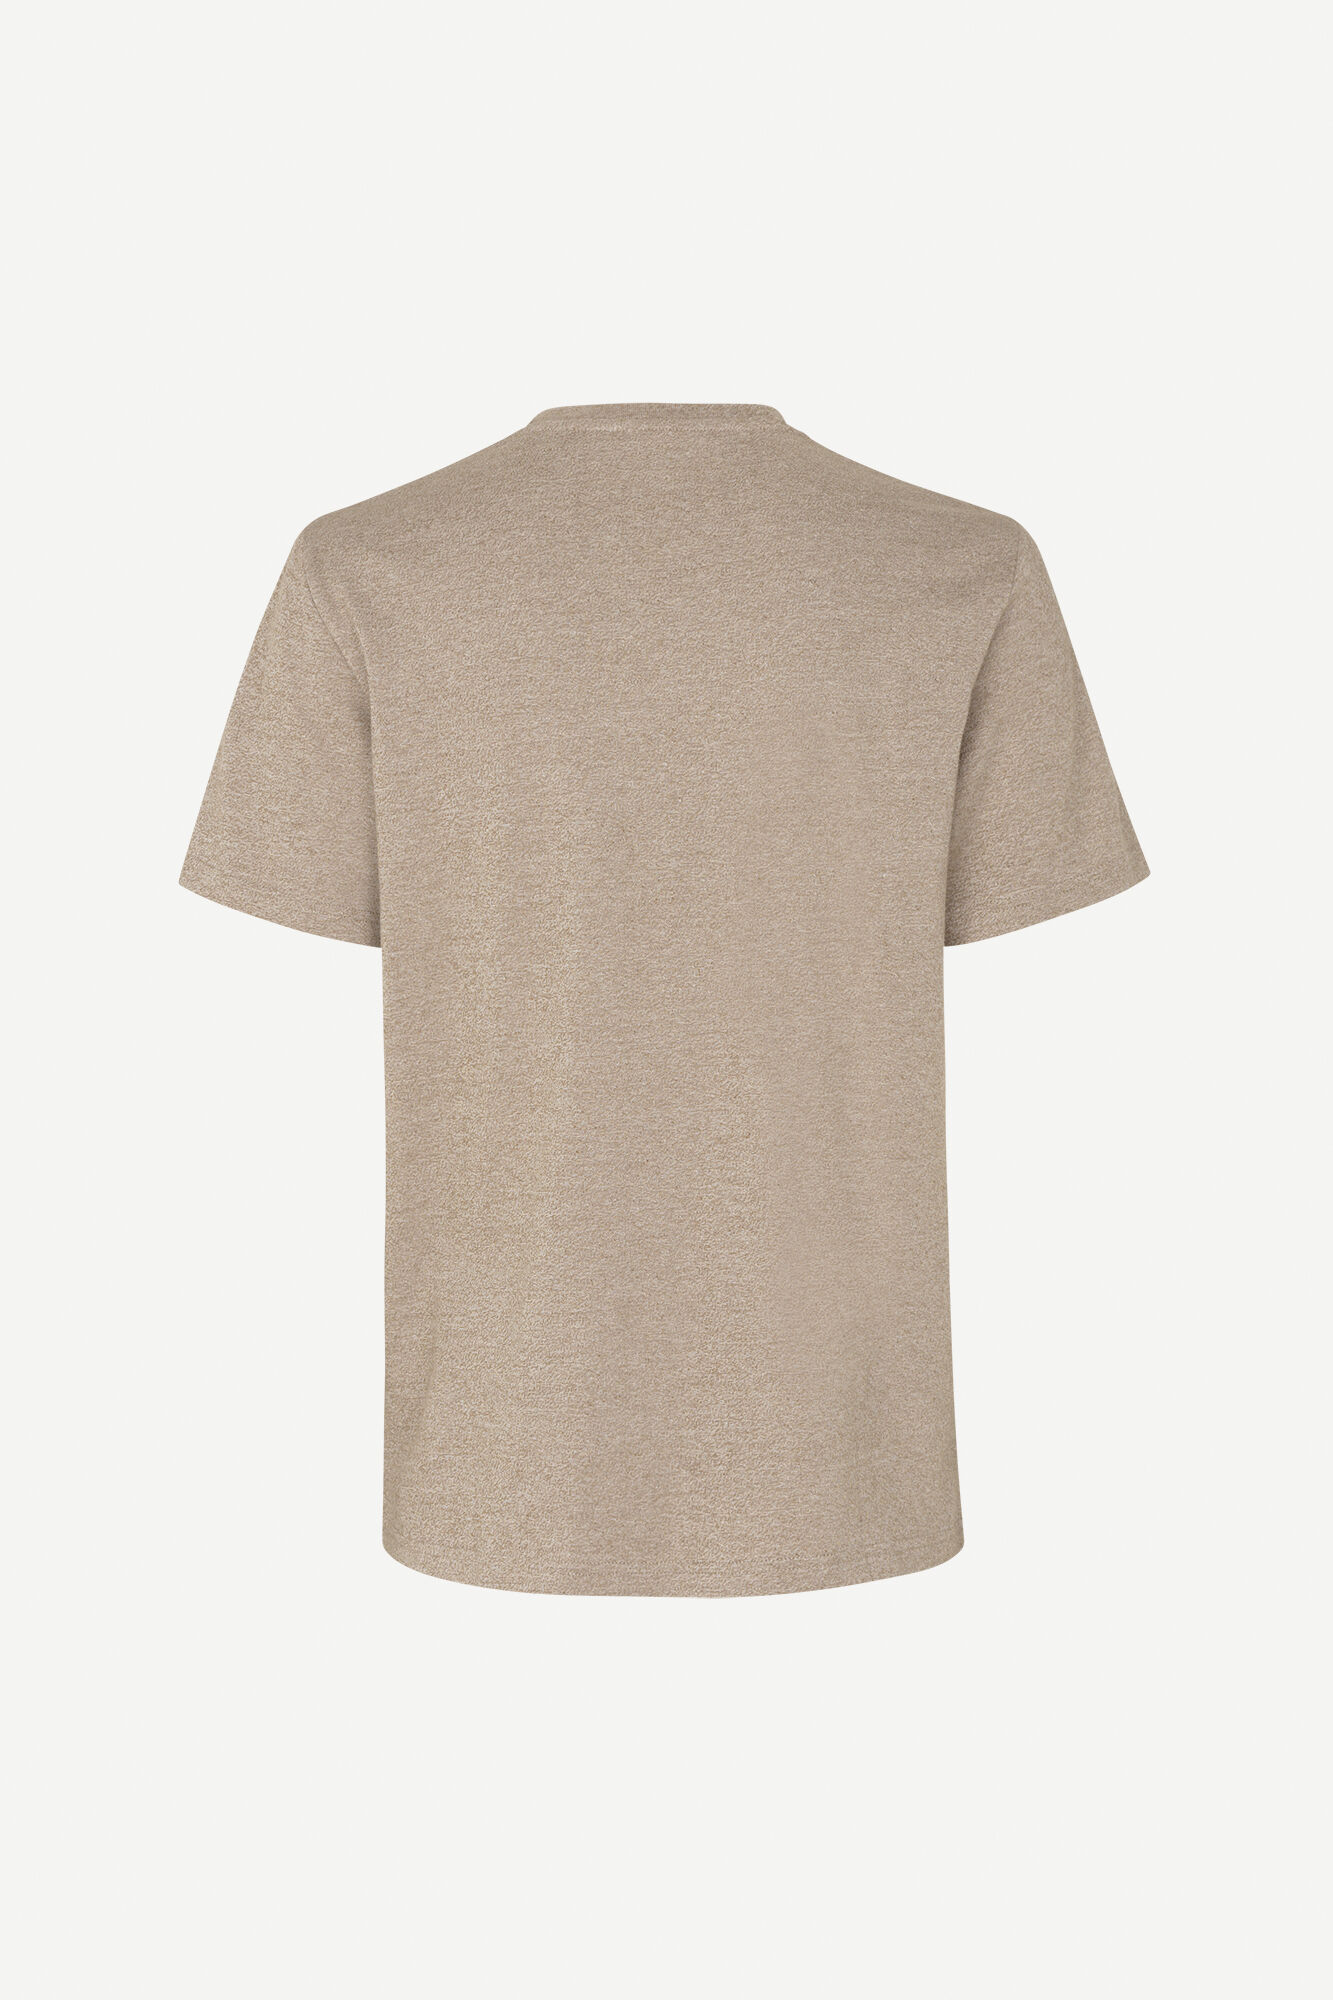 Carpo t-shirt mel 7888, SHITAKE MEL.